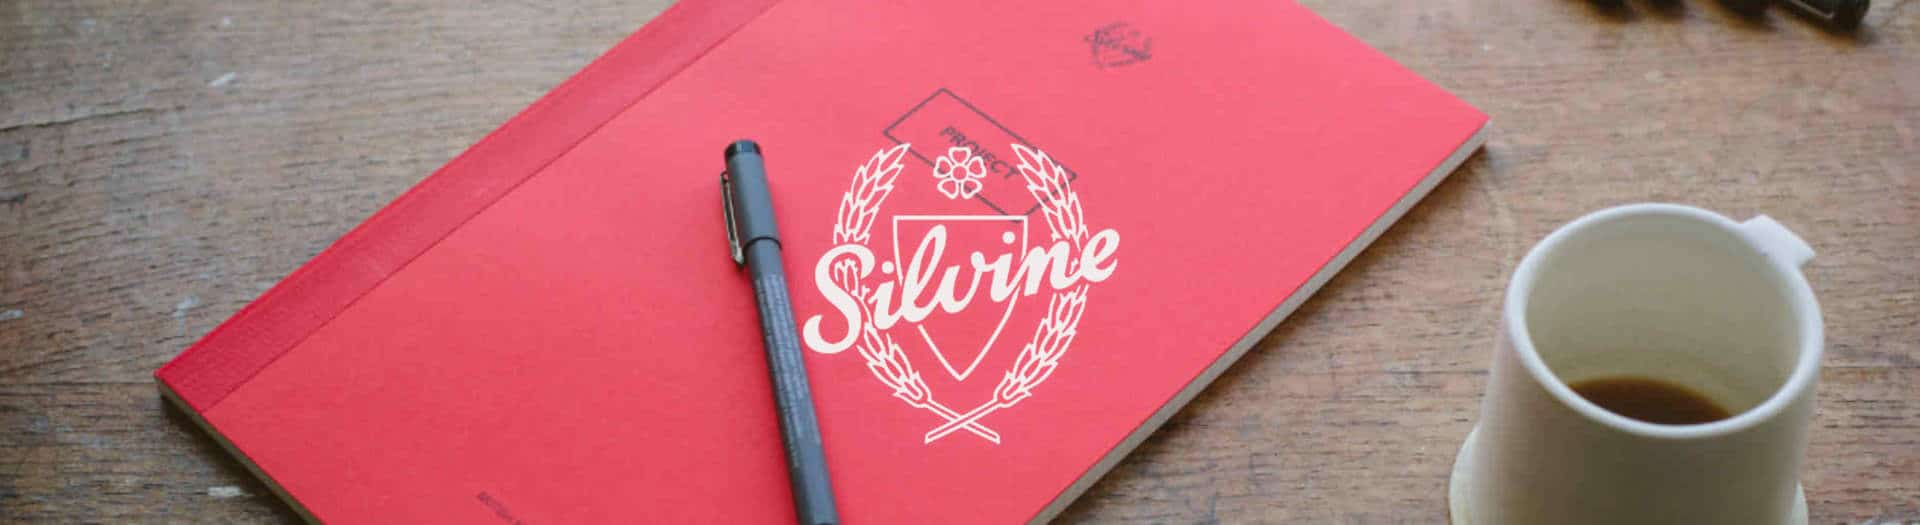 Handmade Silvine Originals notebooks header with white Silvine logo